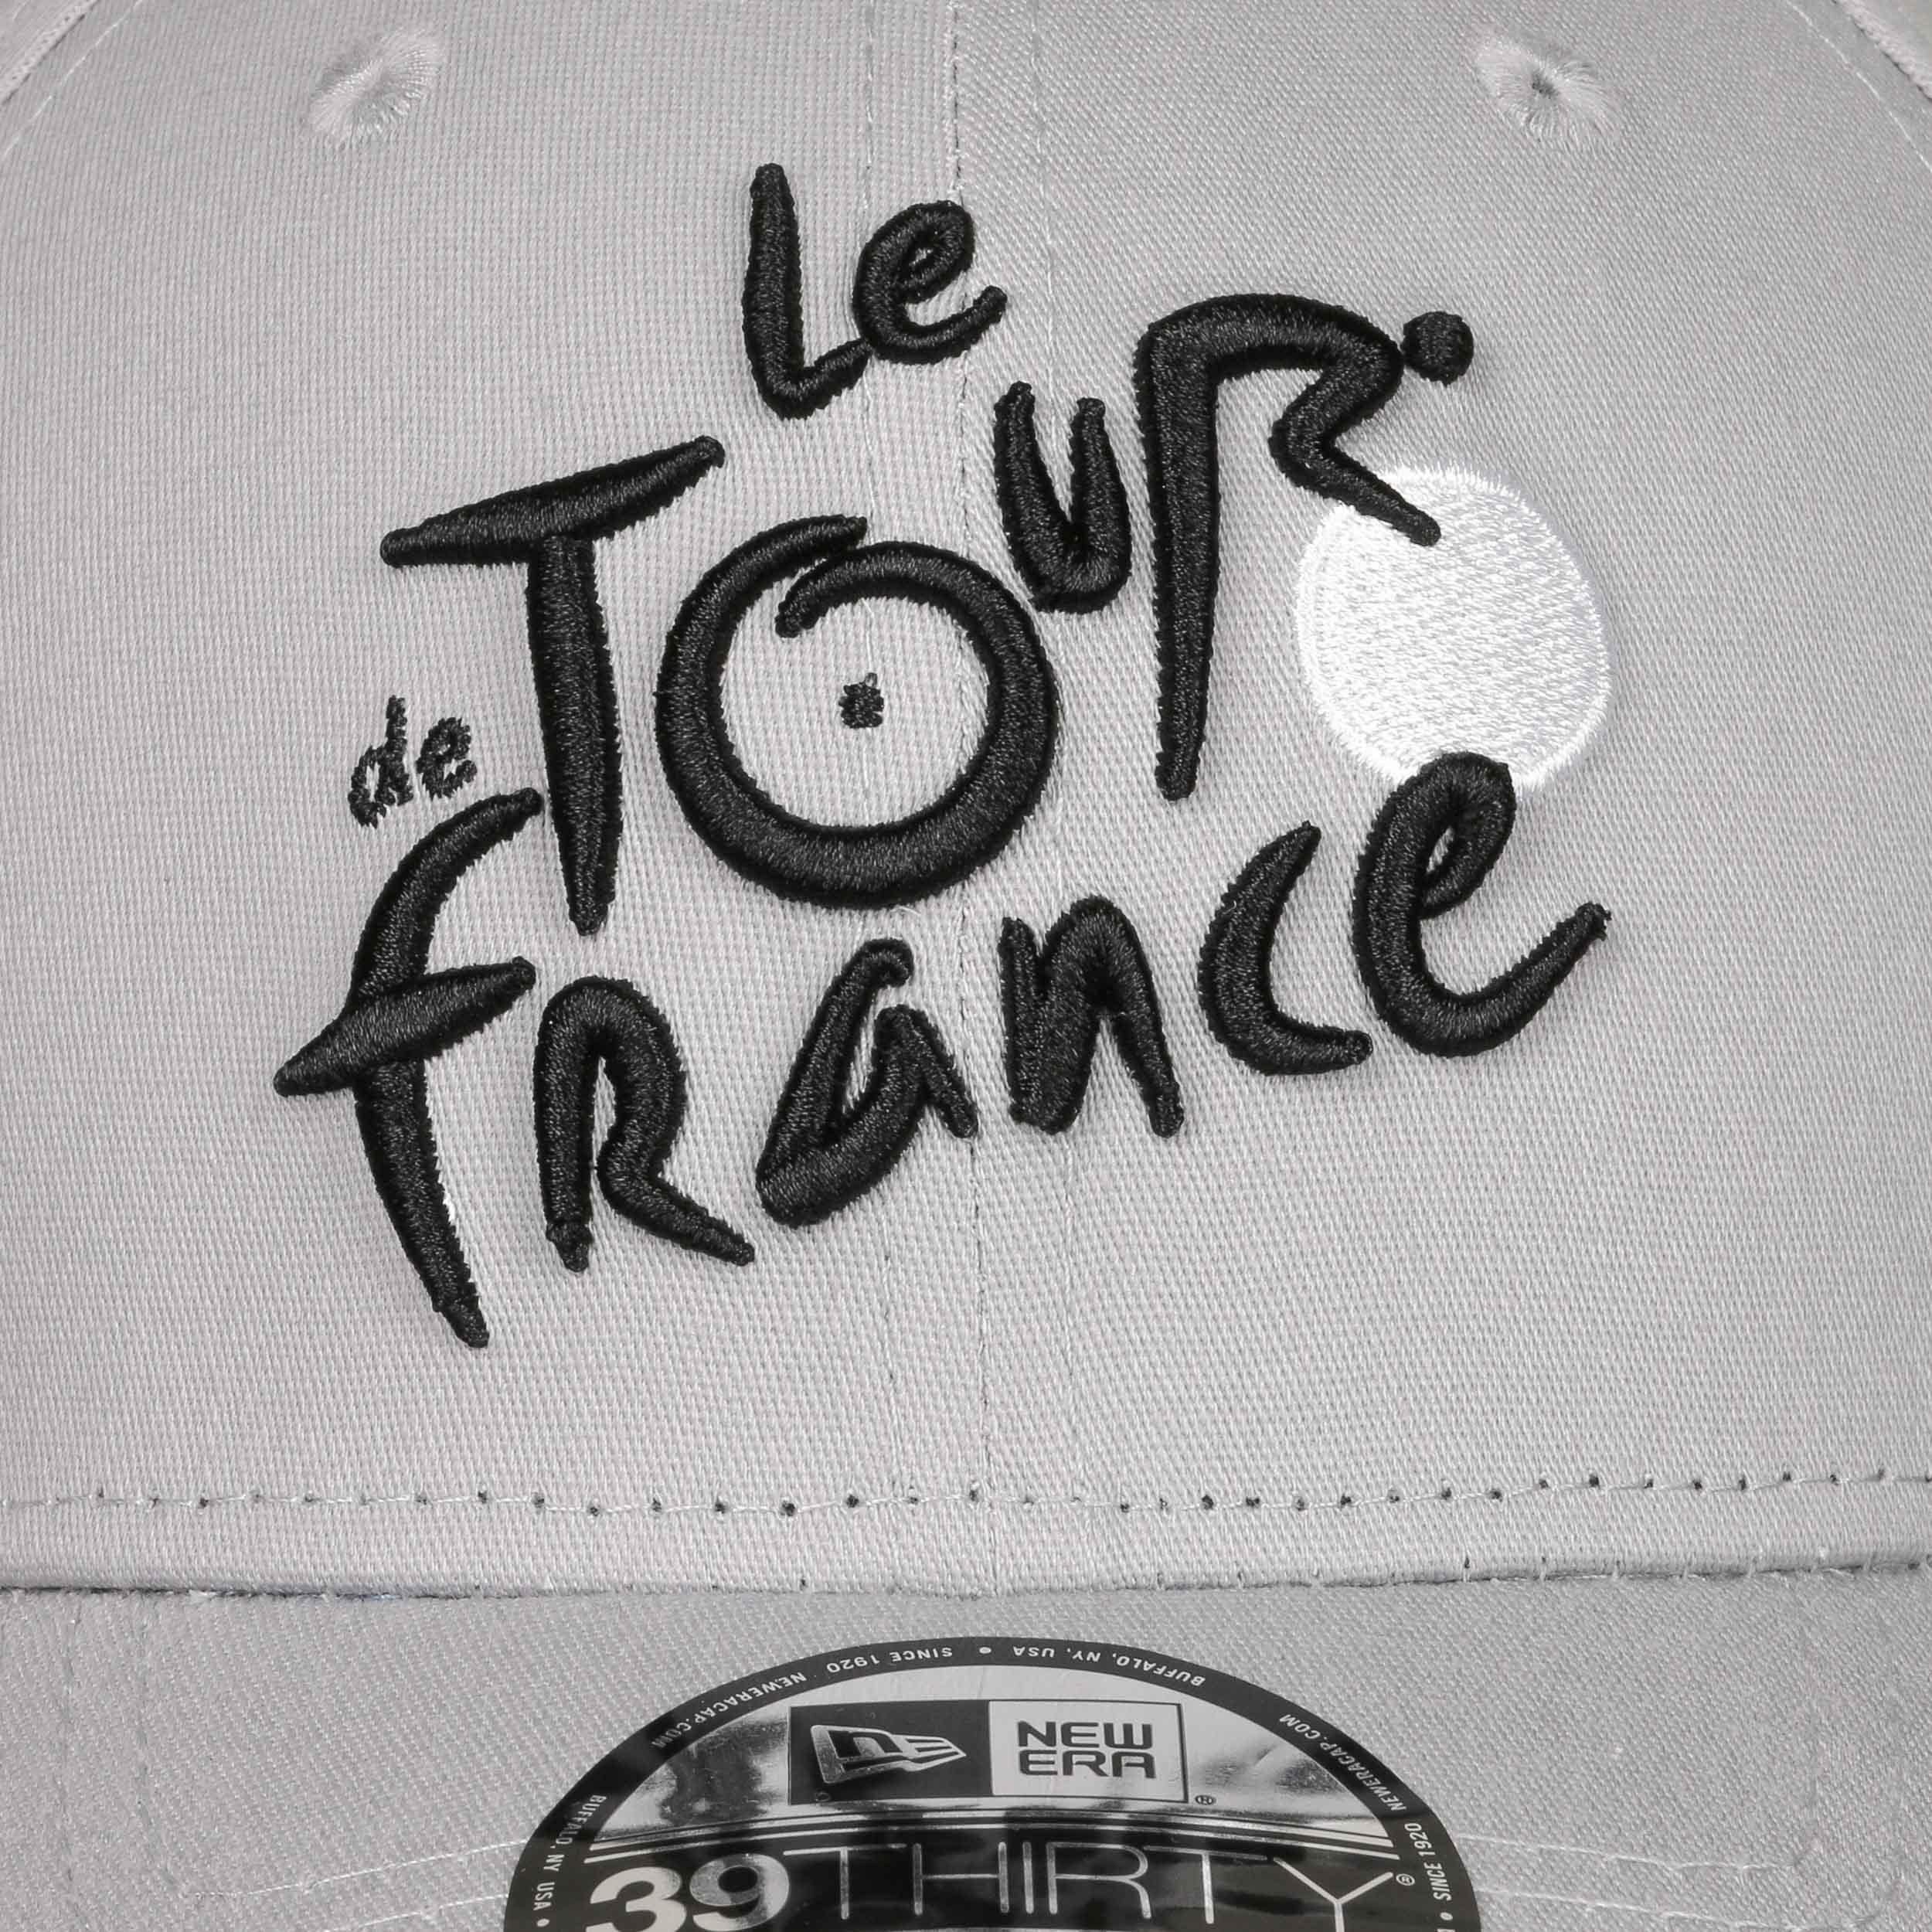 92533b3ada4 ... 39Thirty Le Tour De France Cap by New Era - grey 4 ...